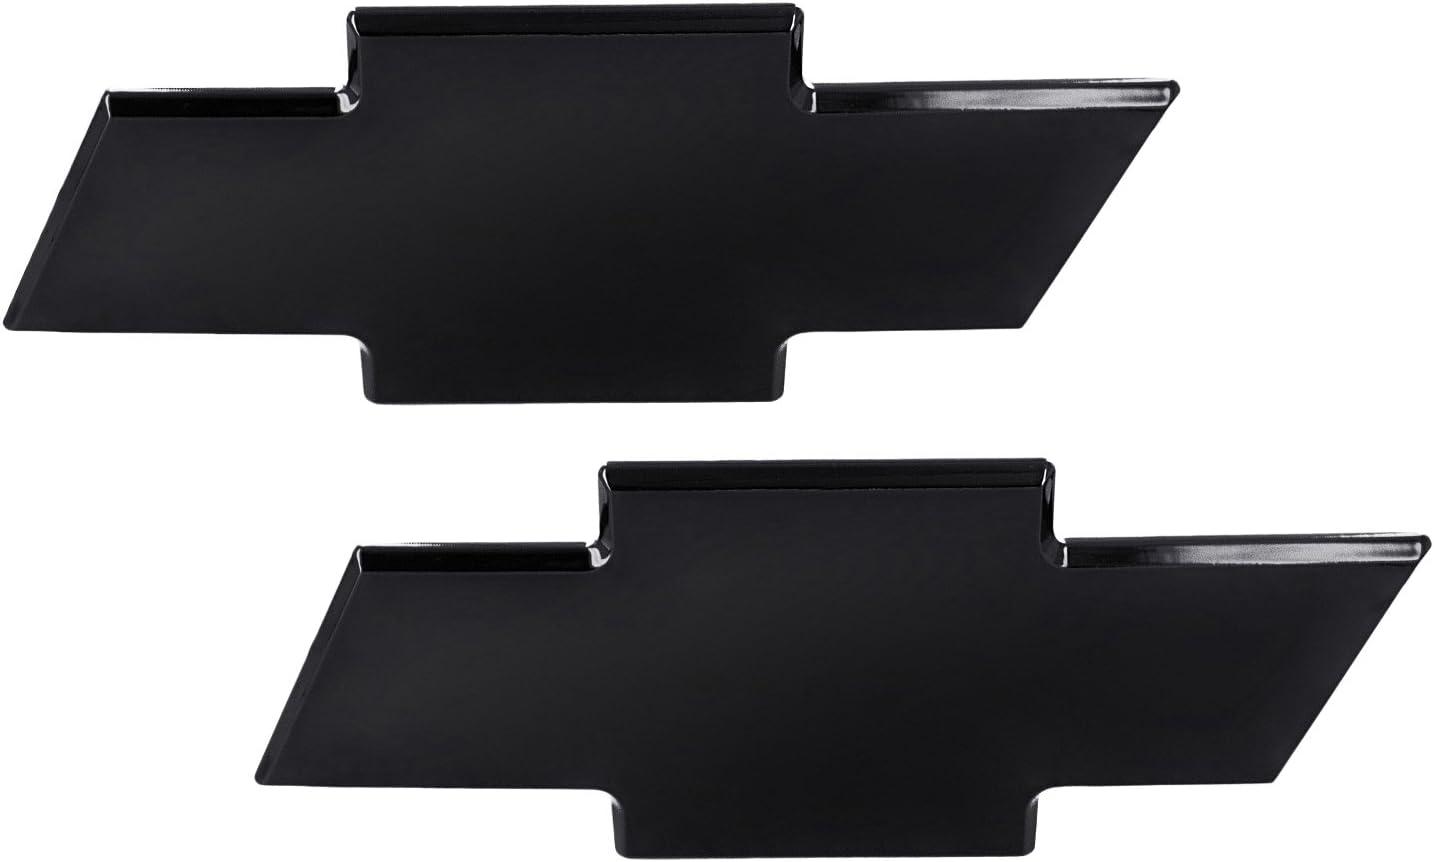 AMI 96129K Chevy Bowtie Grille & Lift gate Emblem without Border- Black Powder coat, 1 Pack